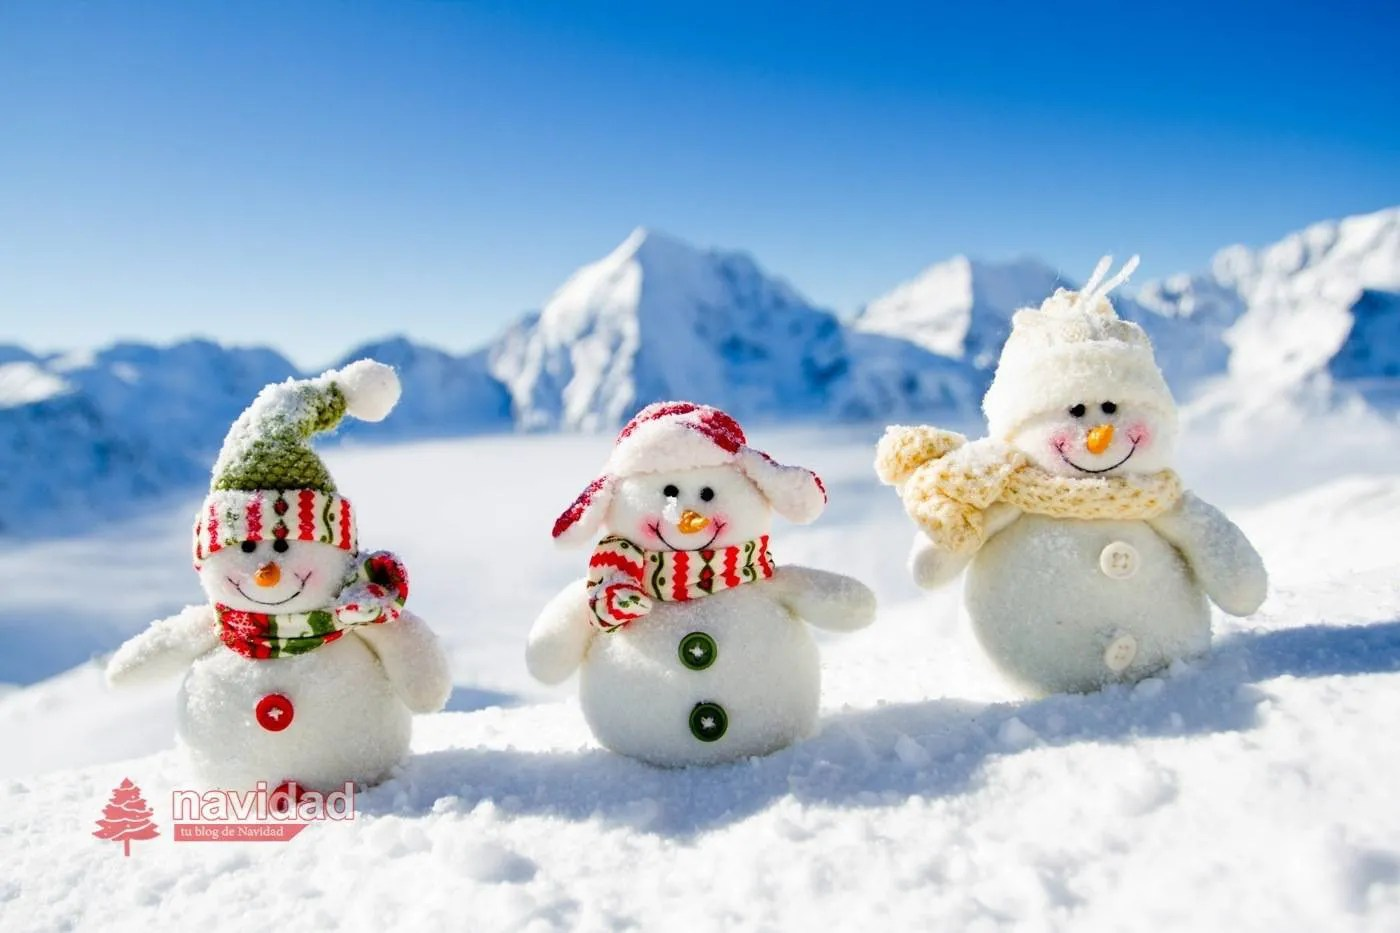 fondopantallanavidades1  Navidad Tu revista navidea